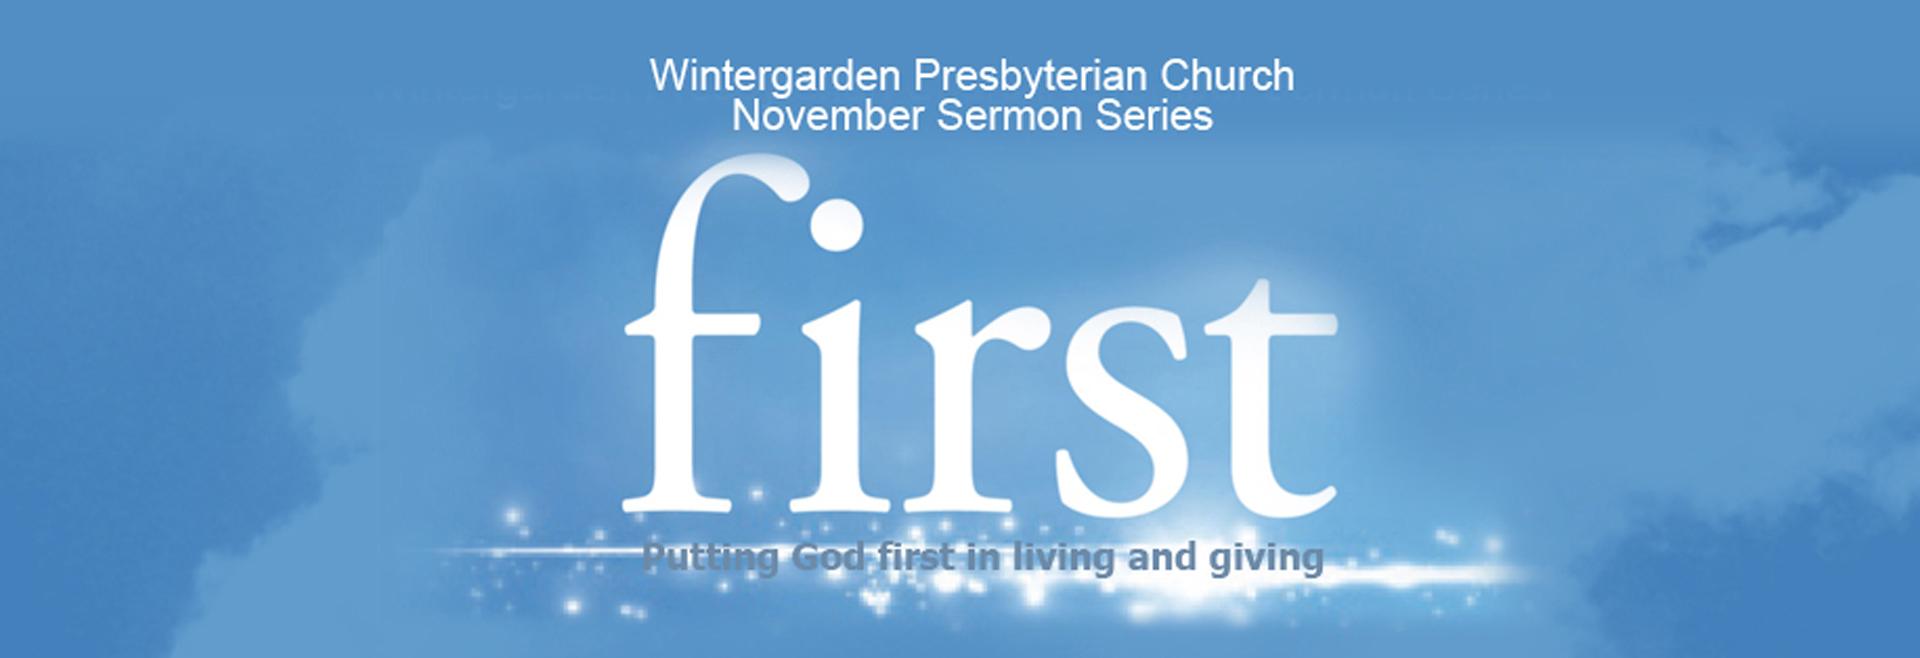 first-november series